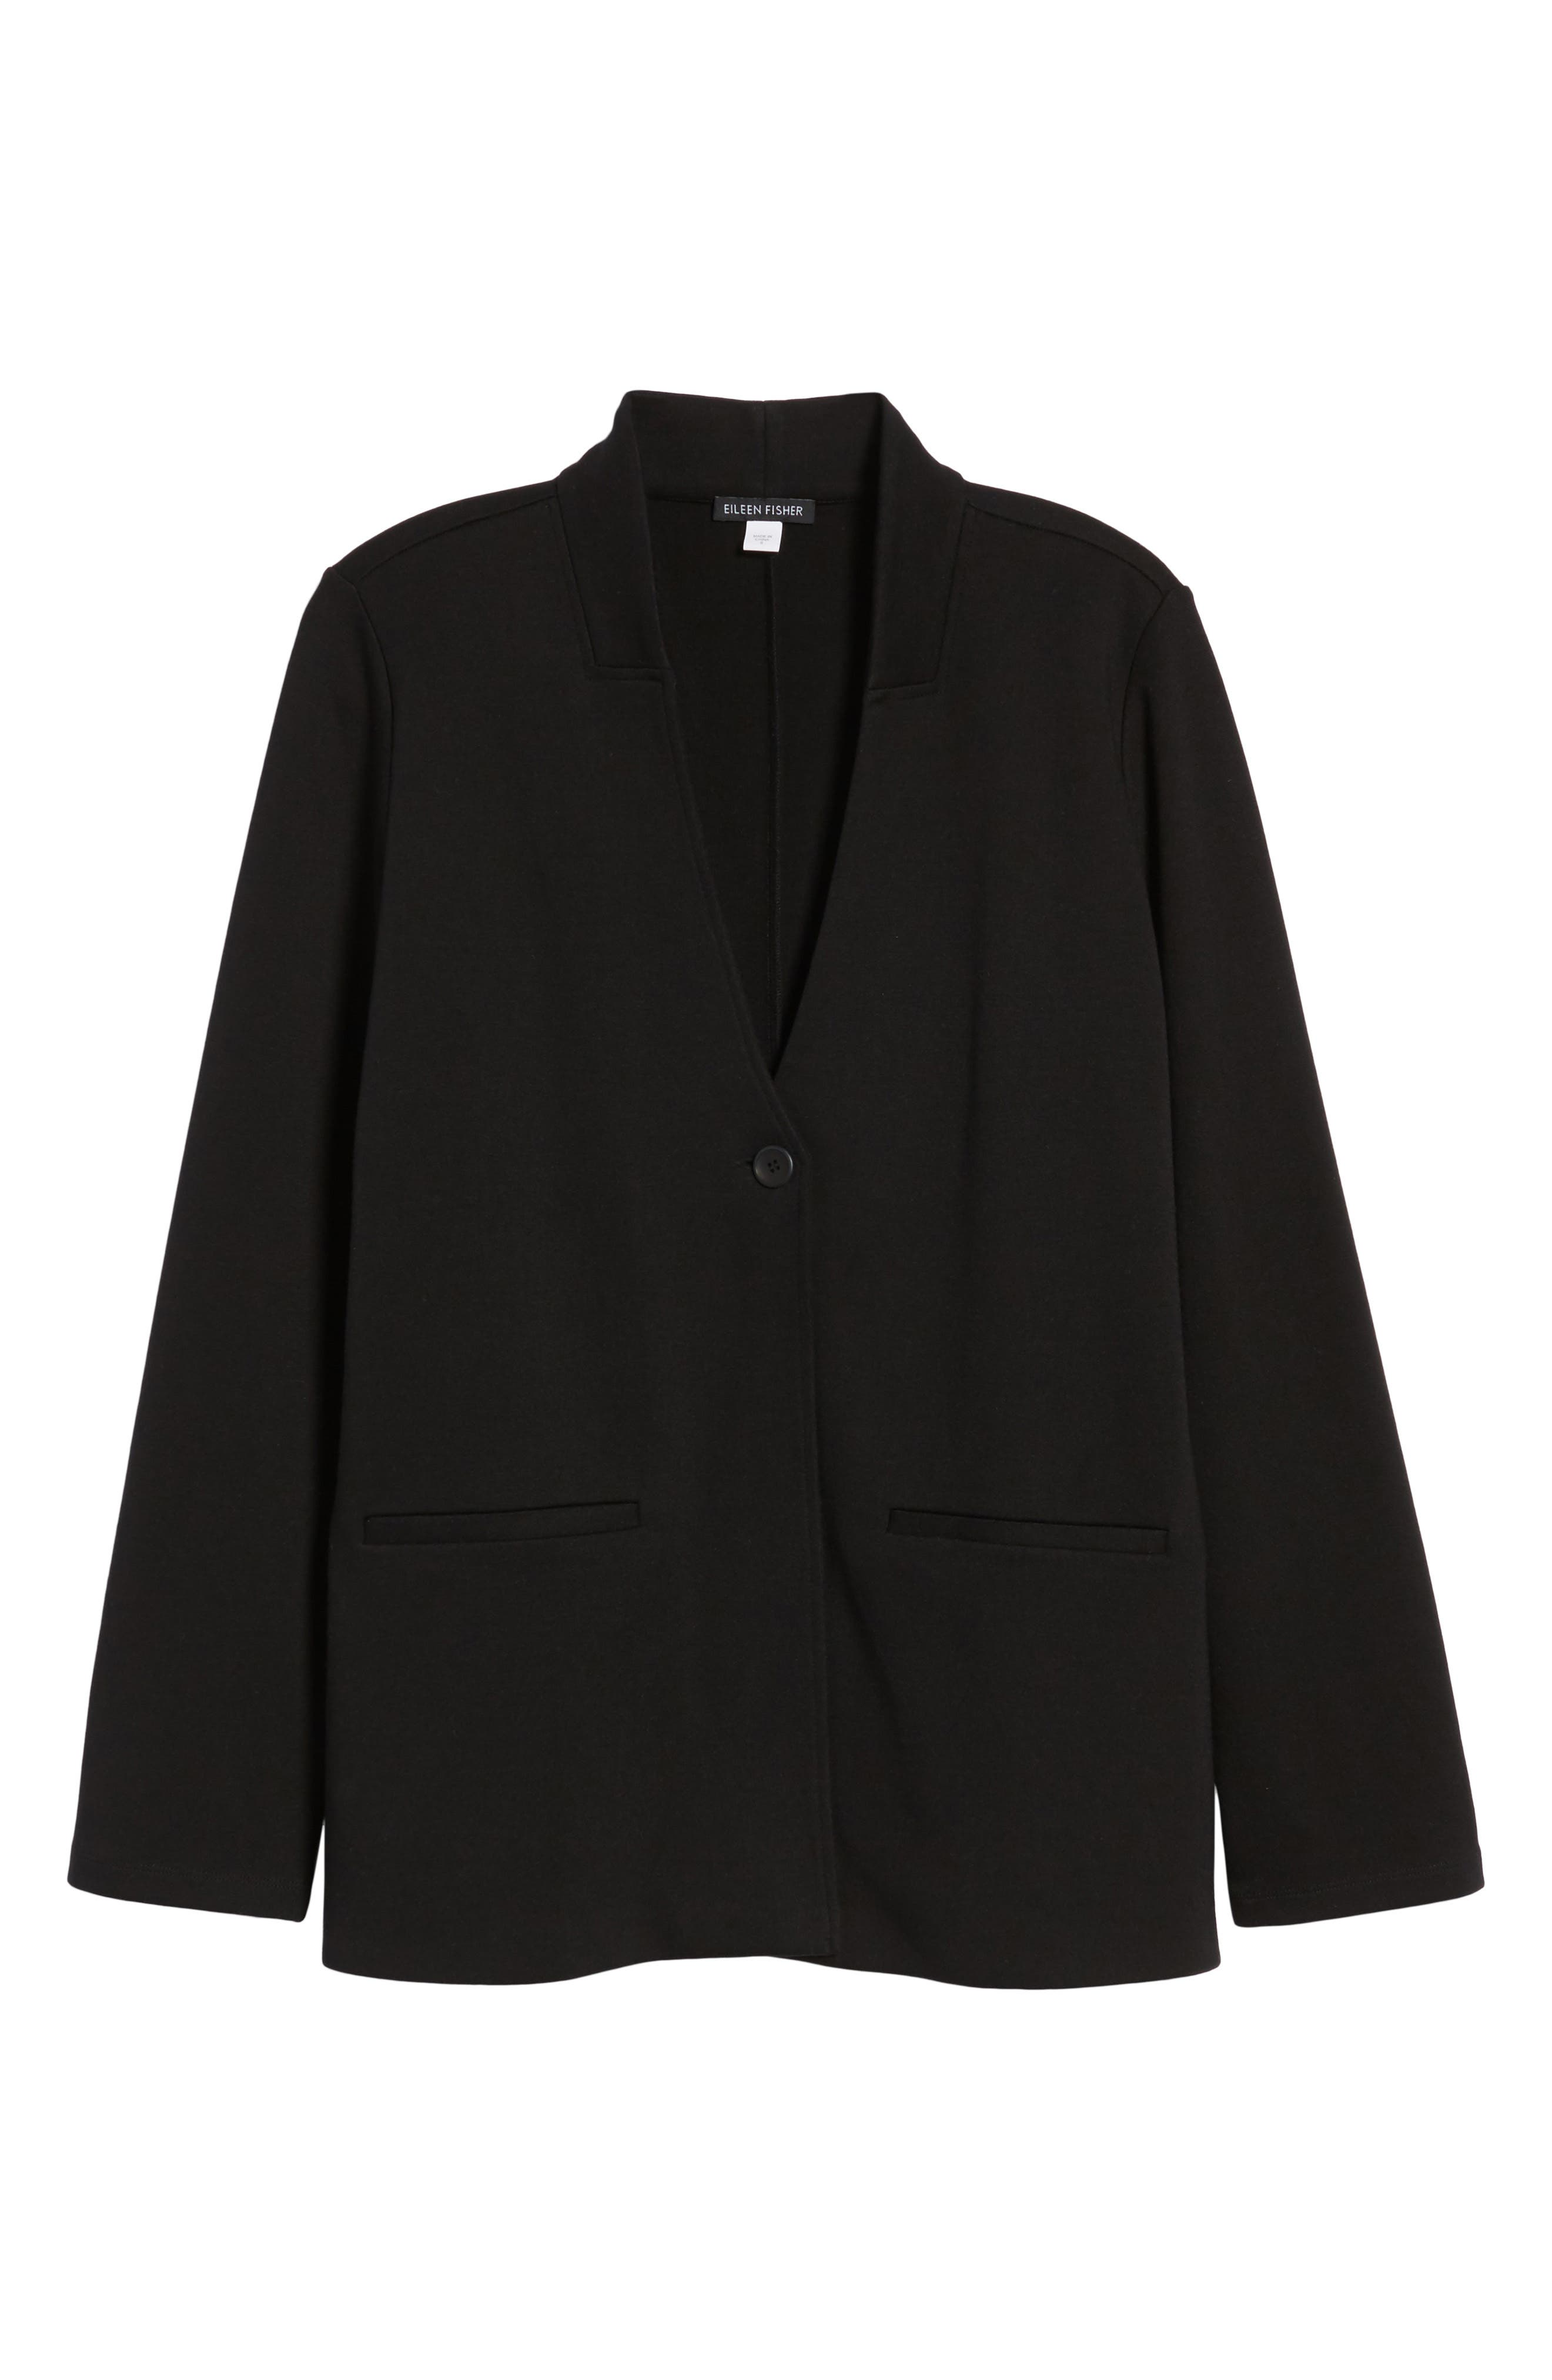 Tencel<sup>®</sup> Lyocell Blend Knit Blazer,                             Alternate thumbnail 6, color,                             Black